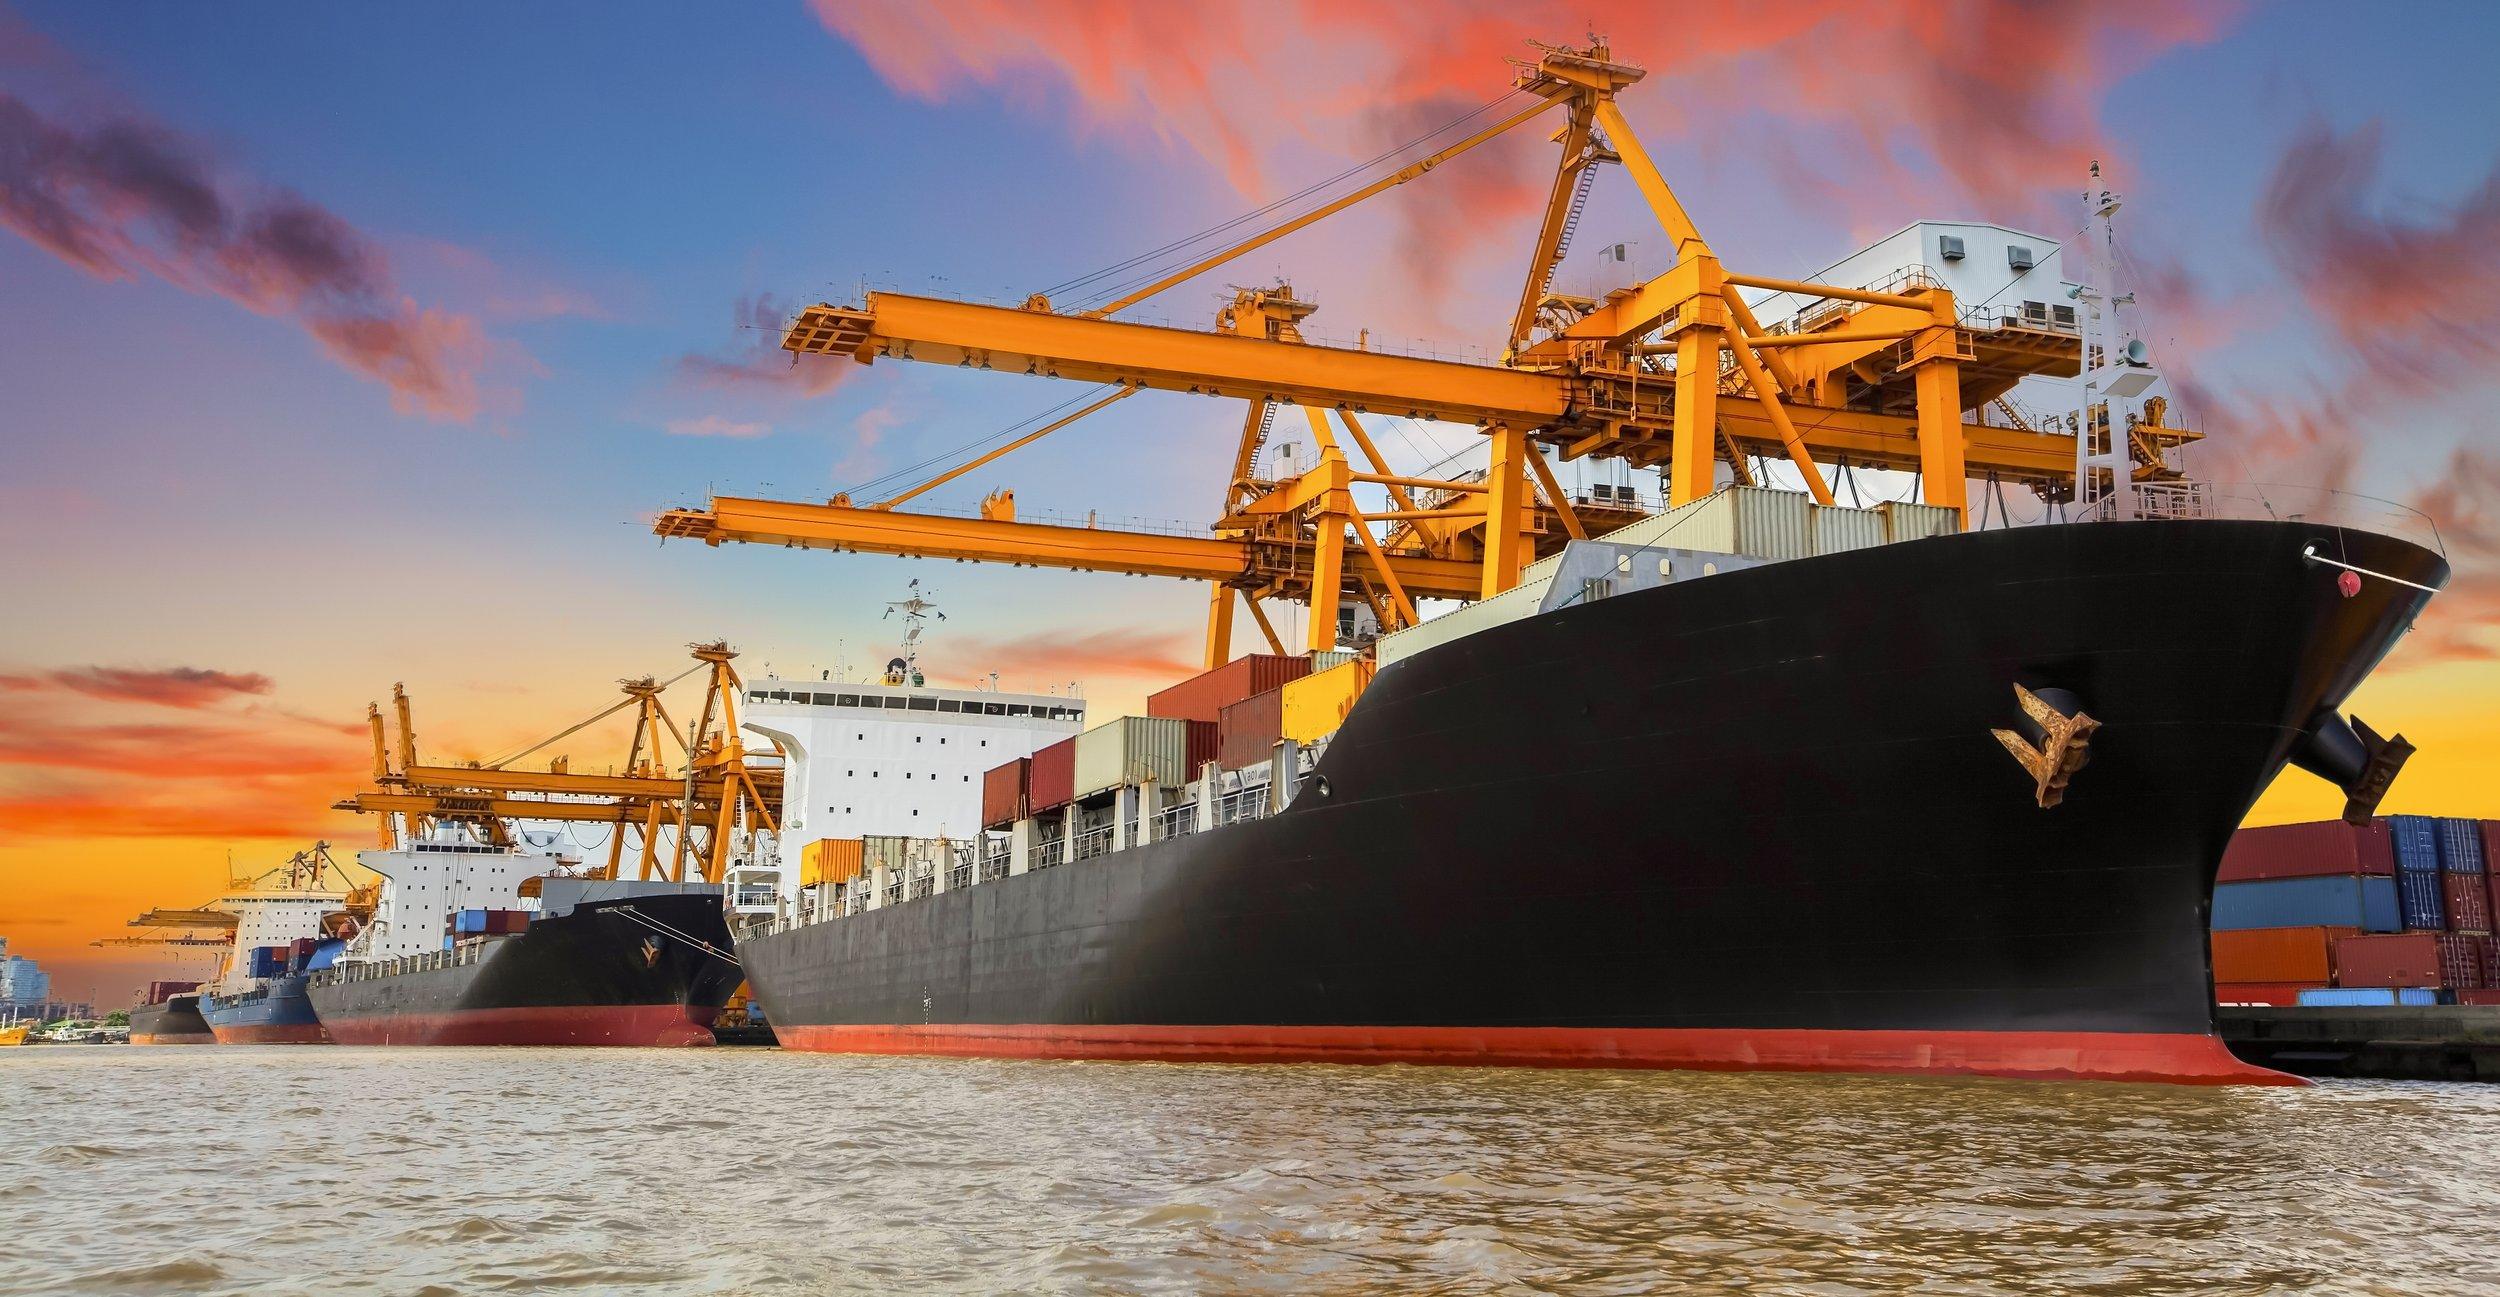 Coastal shipping hero image1.jpg